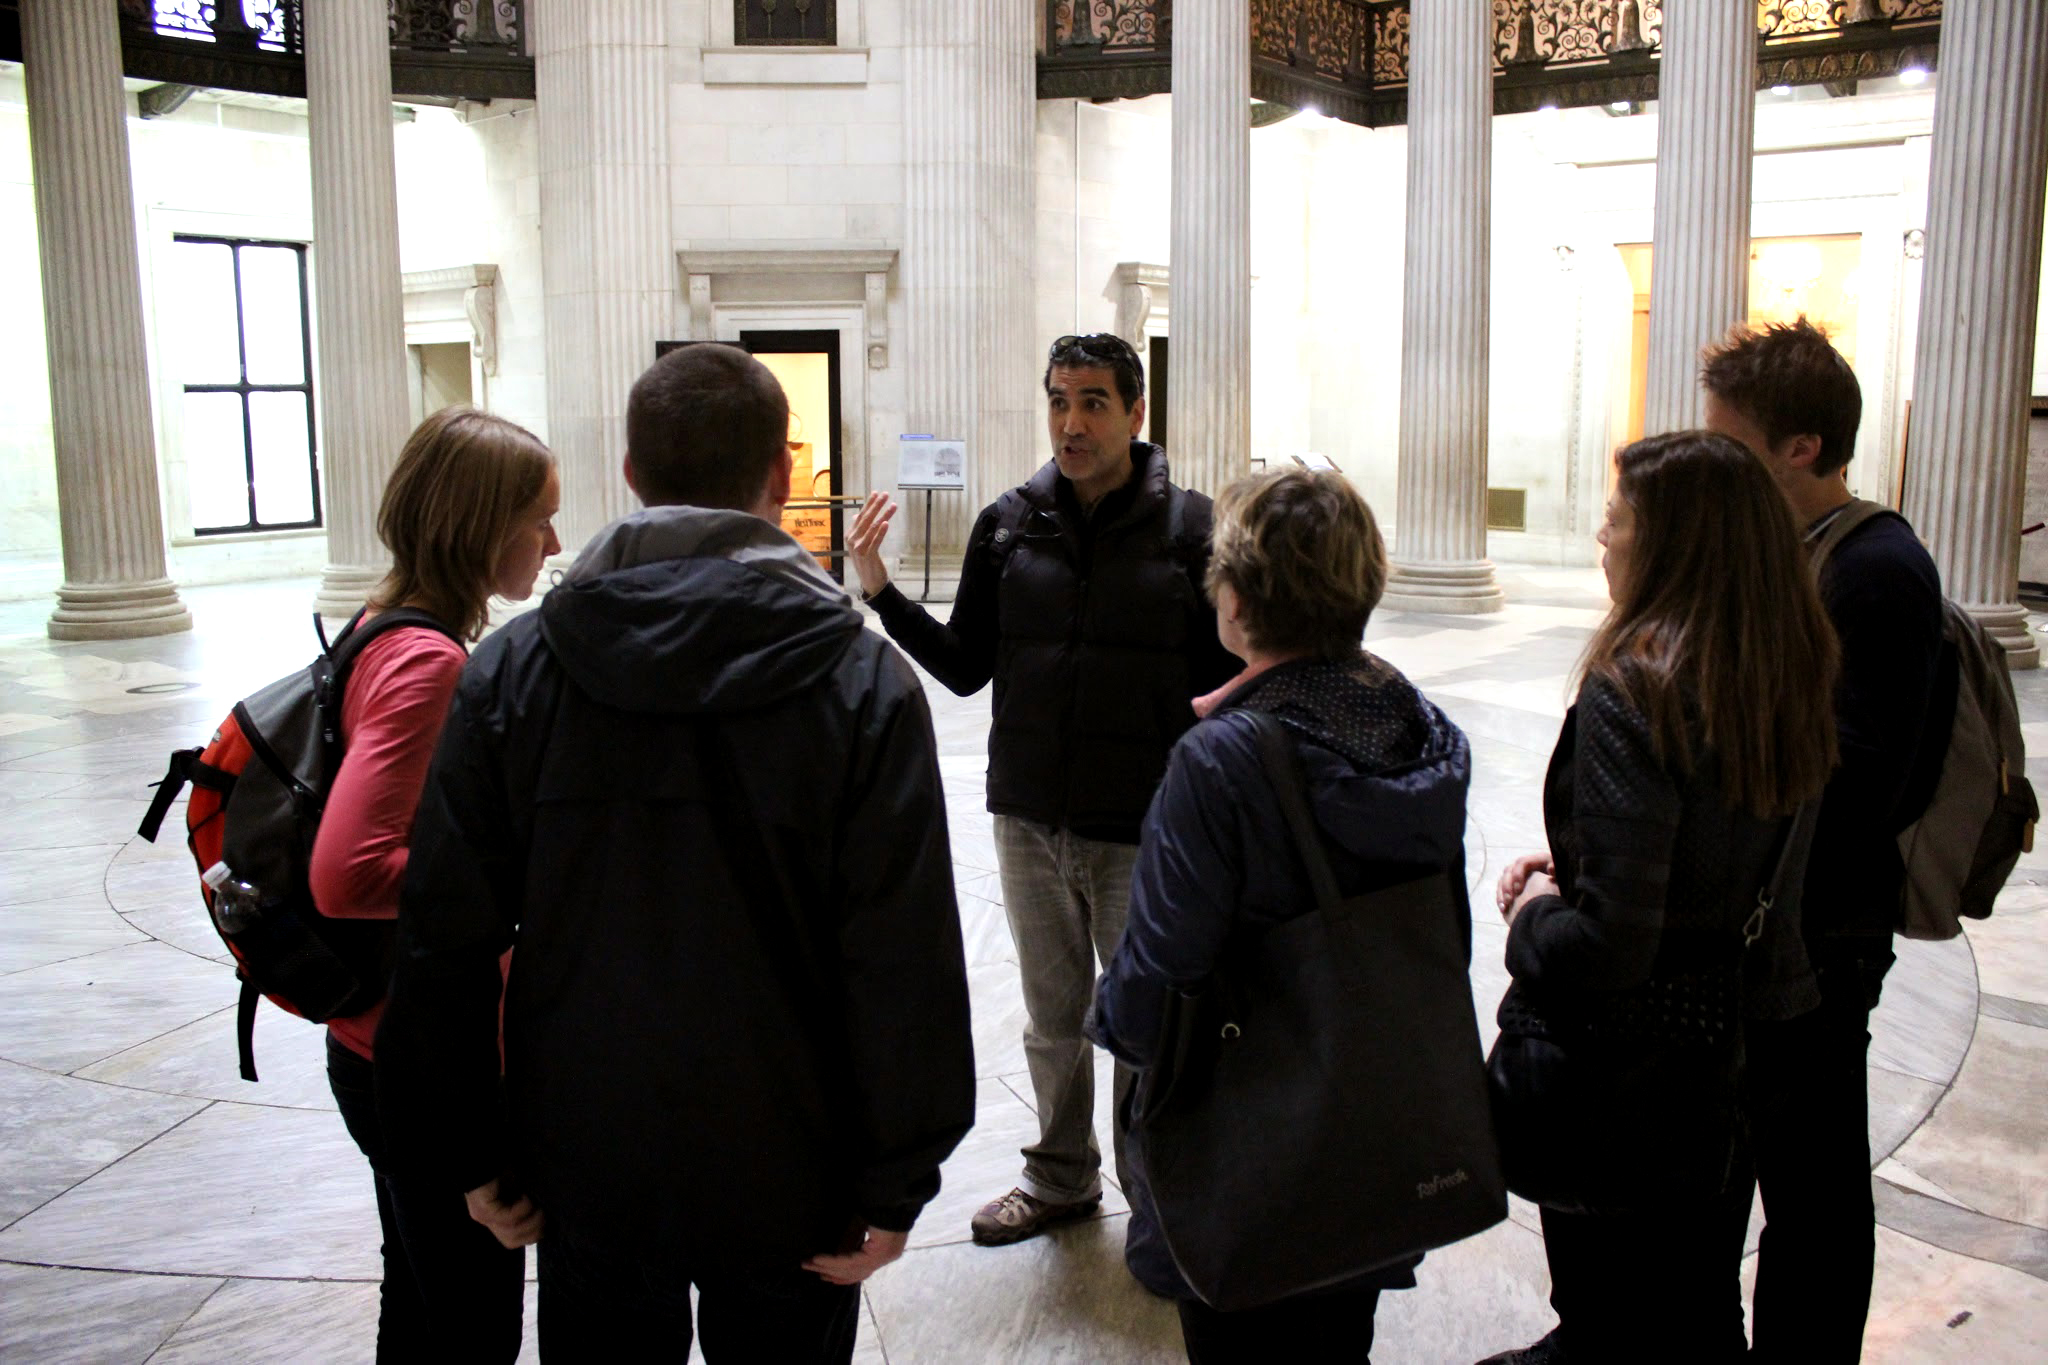 Tour group inside Wall Street